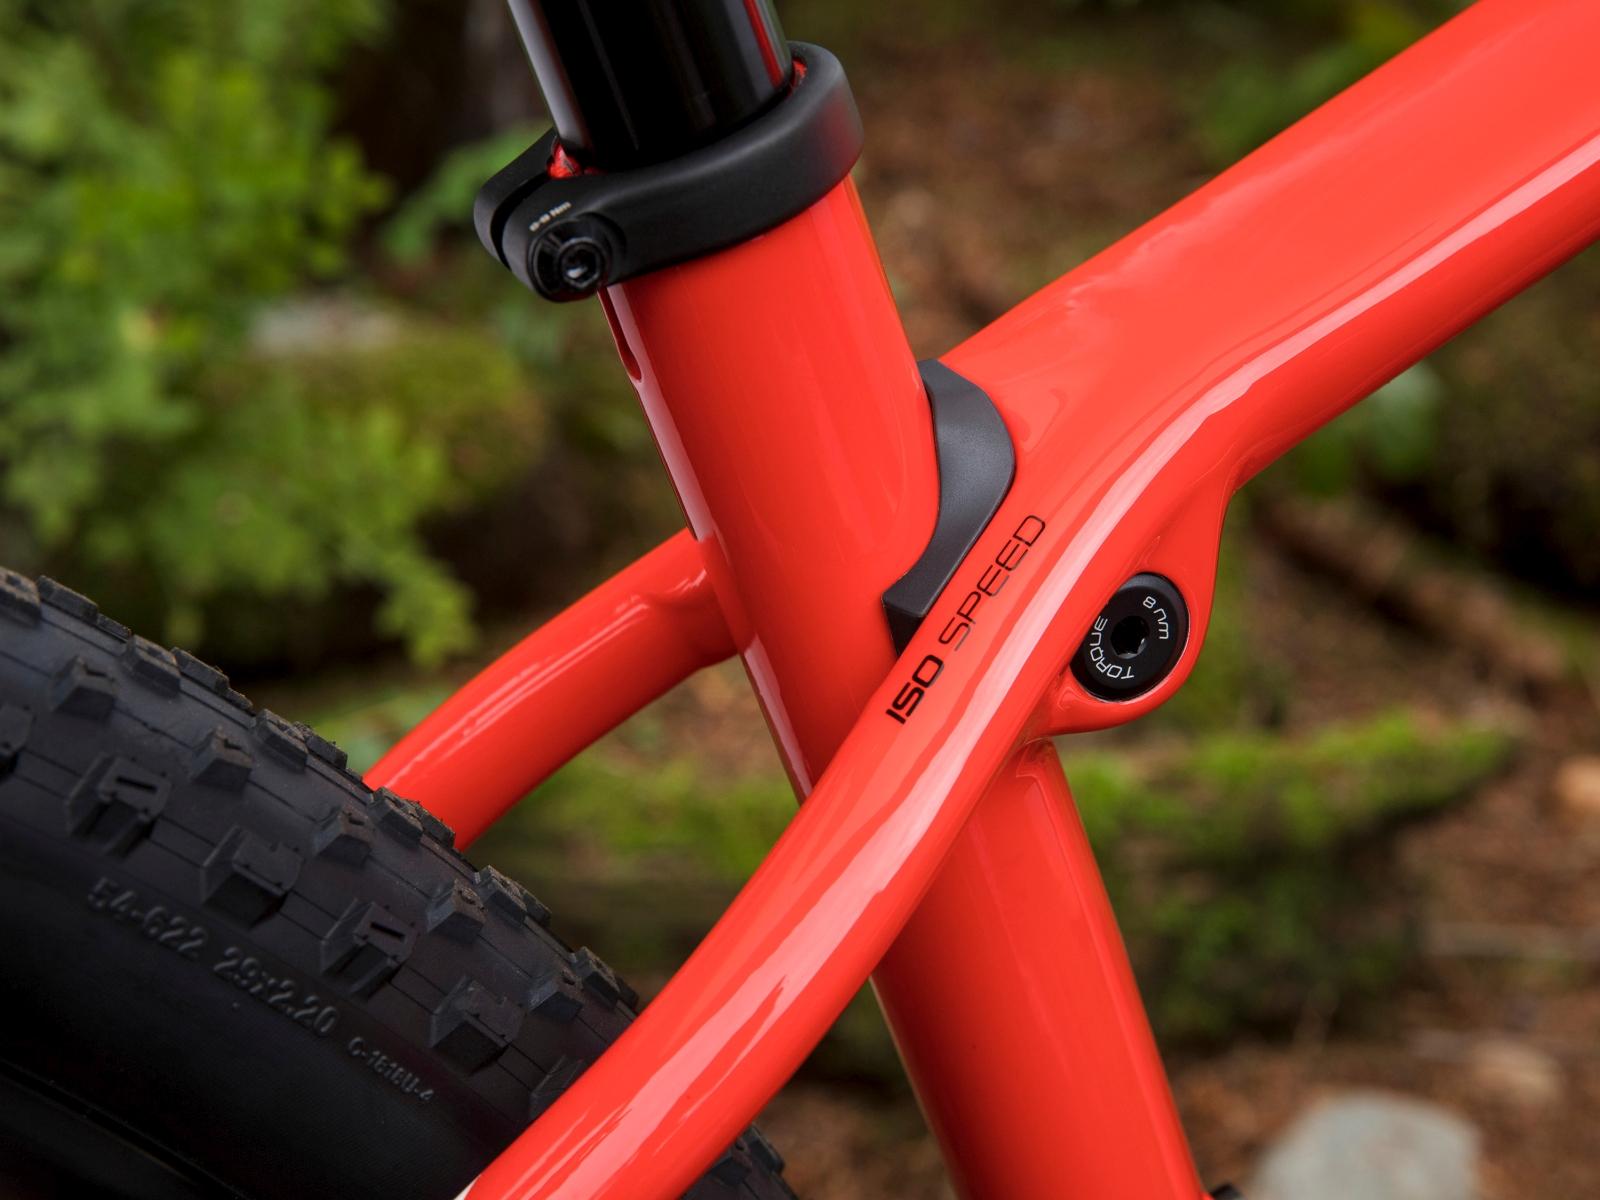 b66a645541 Horské kolo Trek Procaliber 6 - Viper Red - Ski a Bike Centrum Radotín